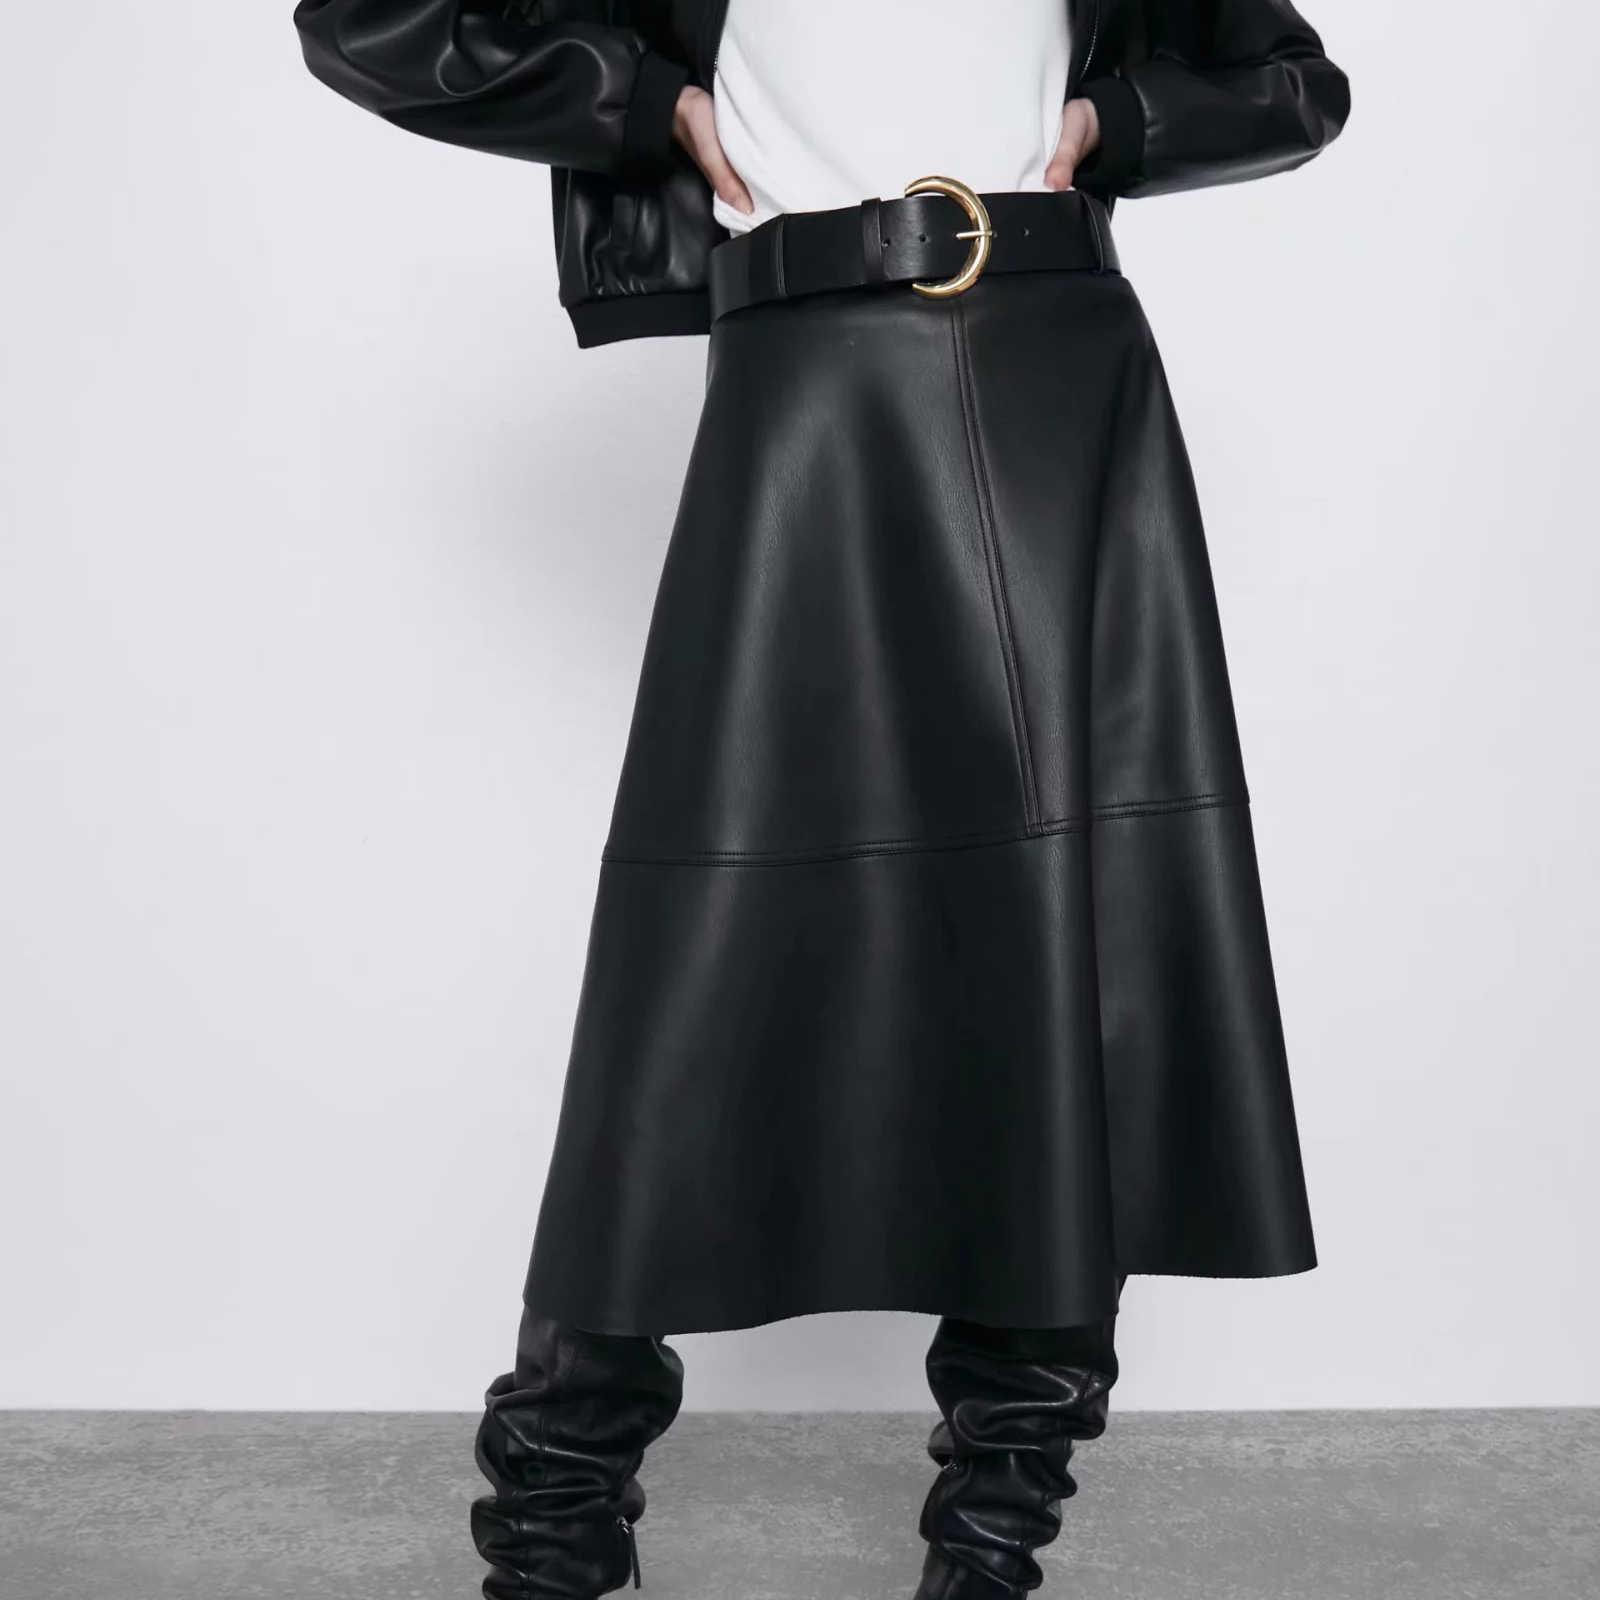 ZA autumn winter women's solid Faux leather A-line high waist black PU long pleated casual punk maxi skirt female women skirts